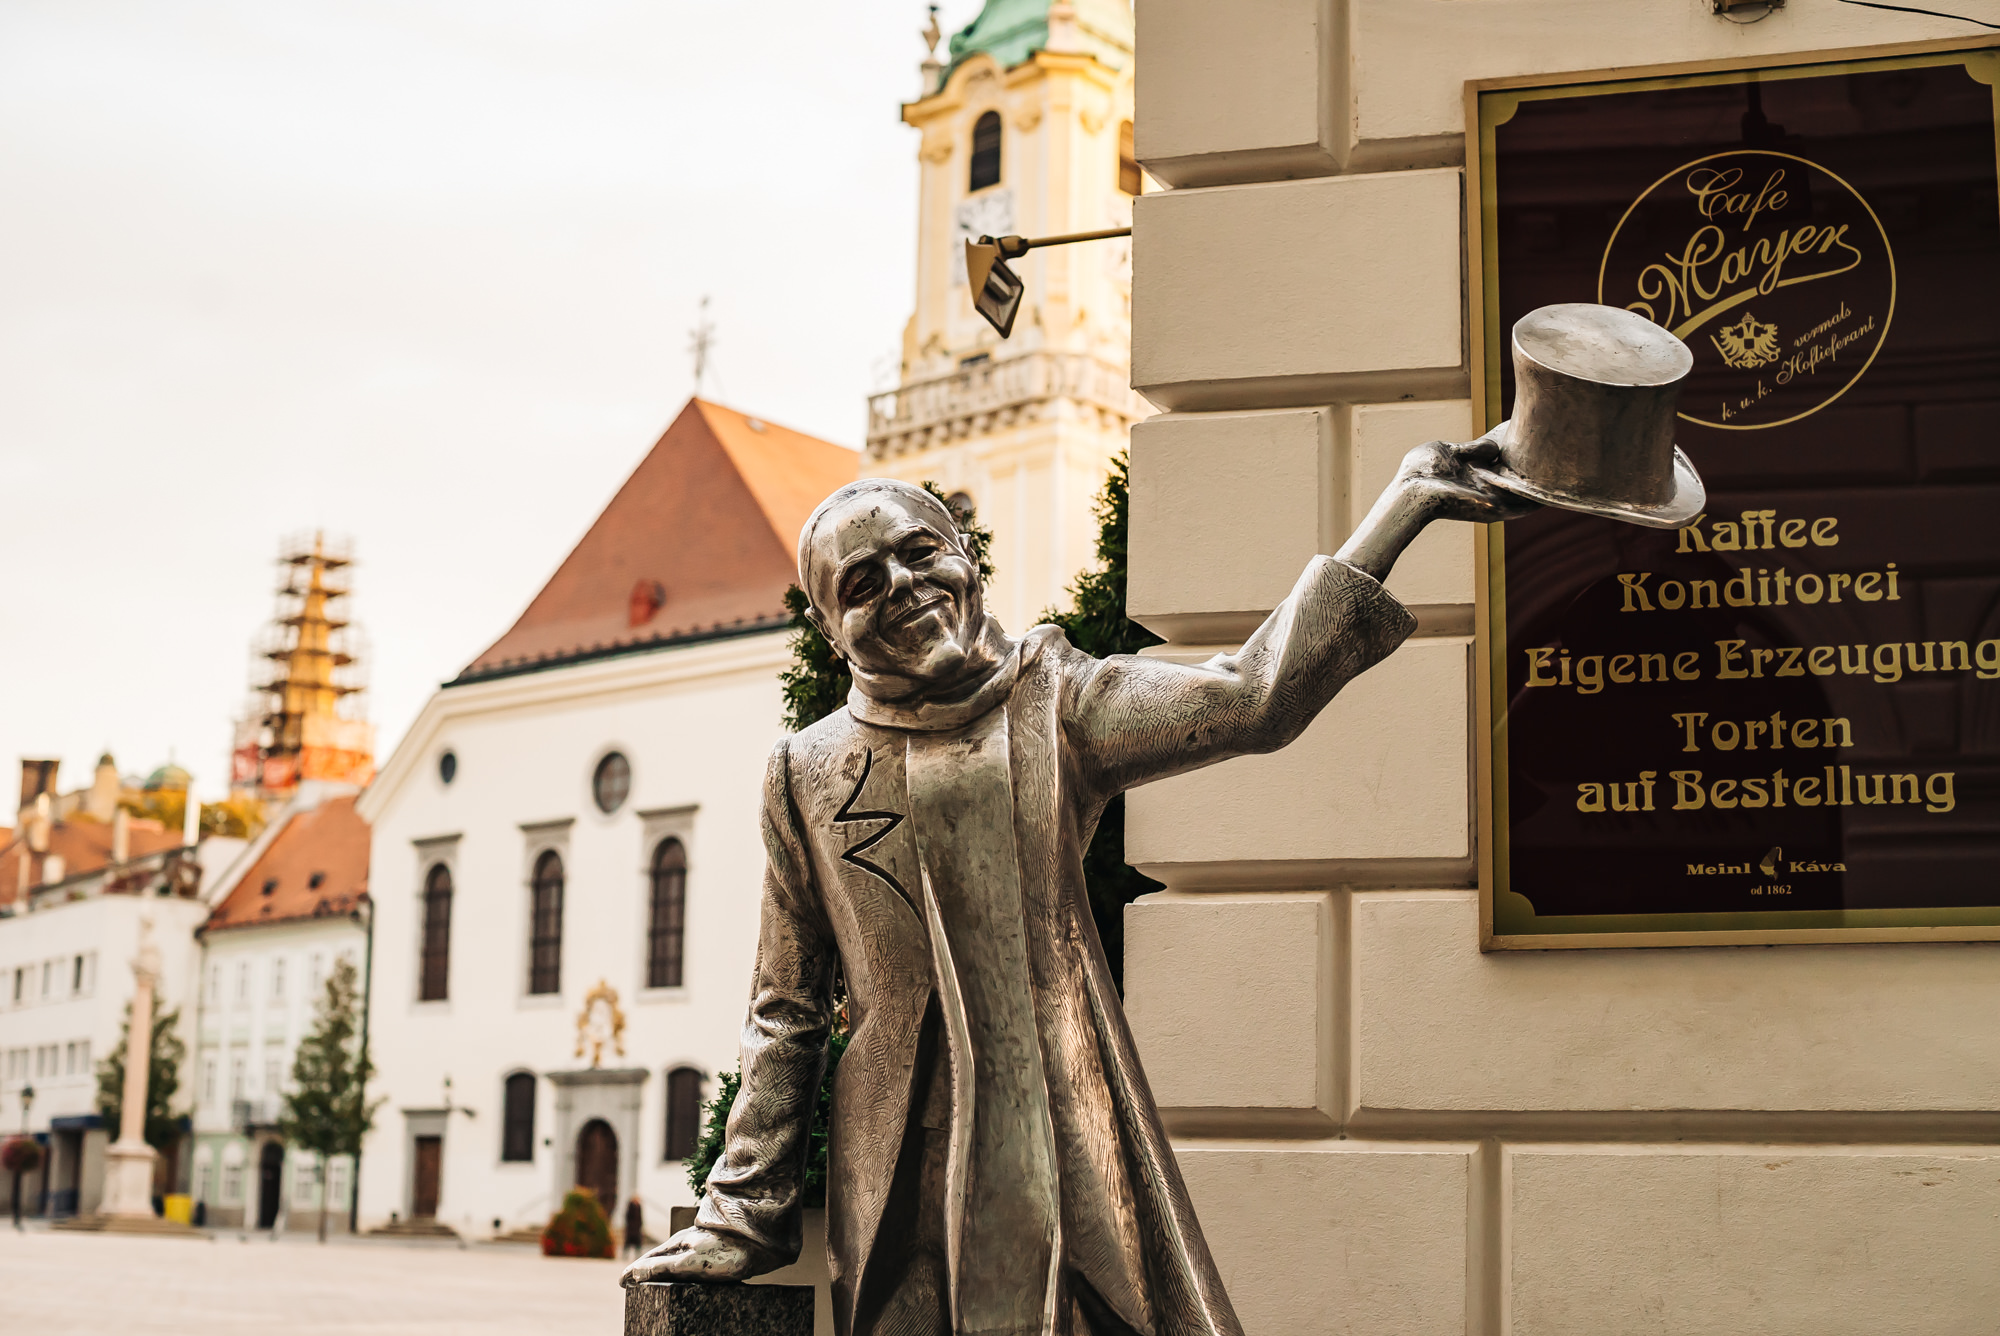 The popular Schonen Naci statue in front of Kaffee Mayer